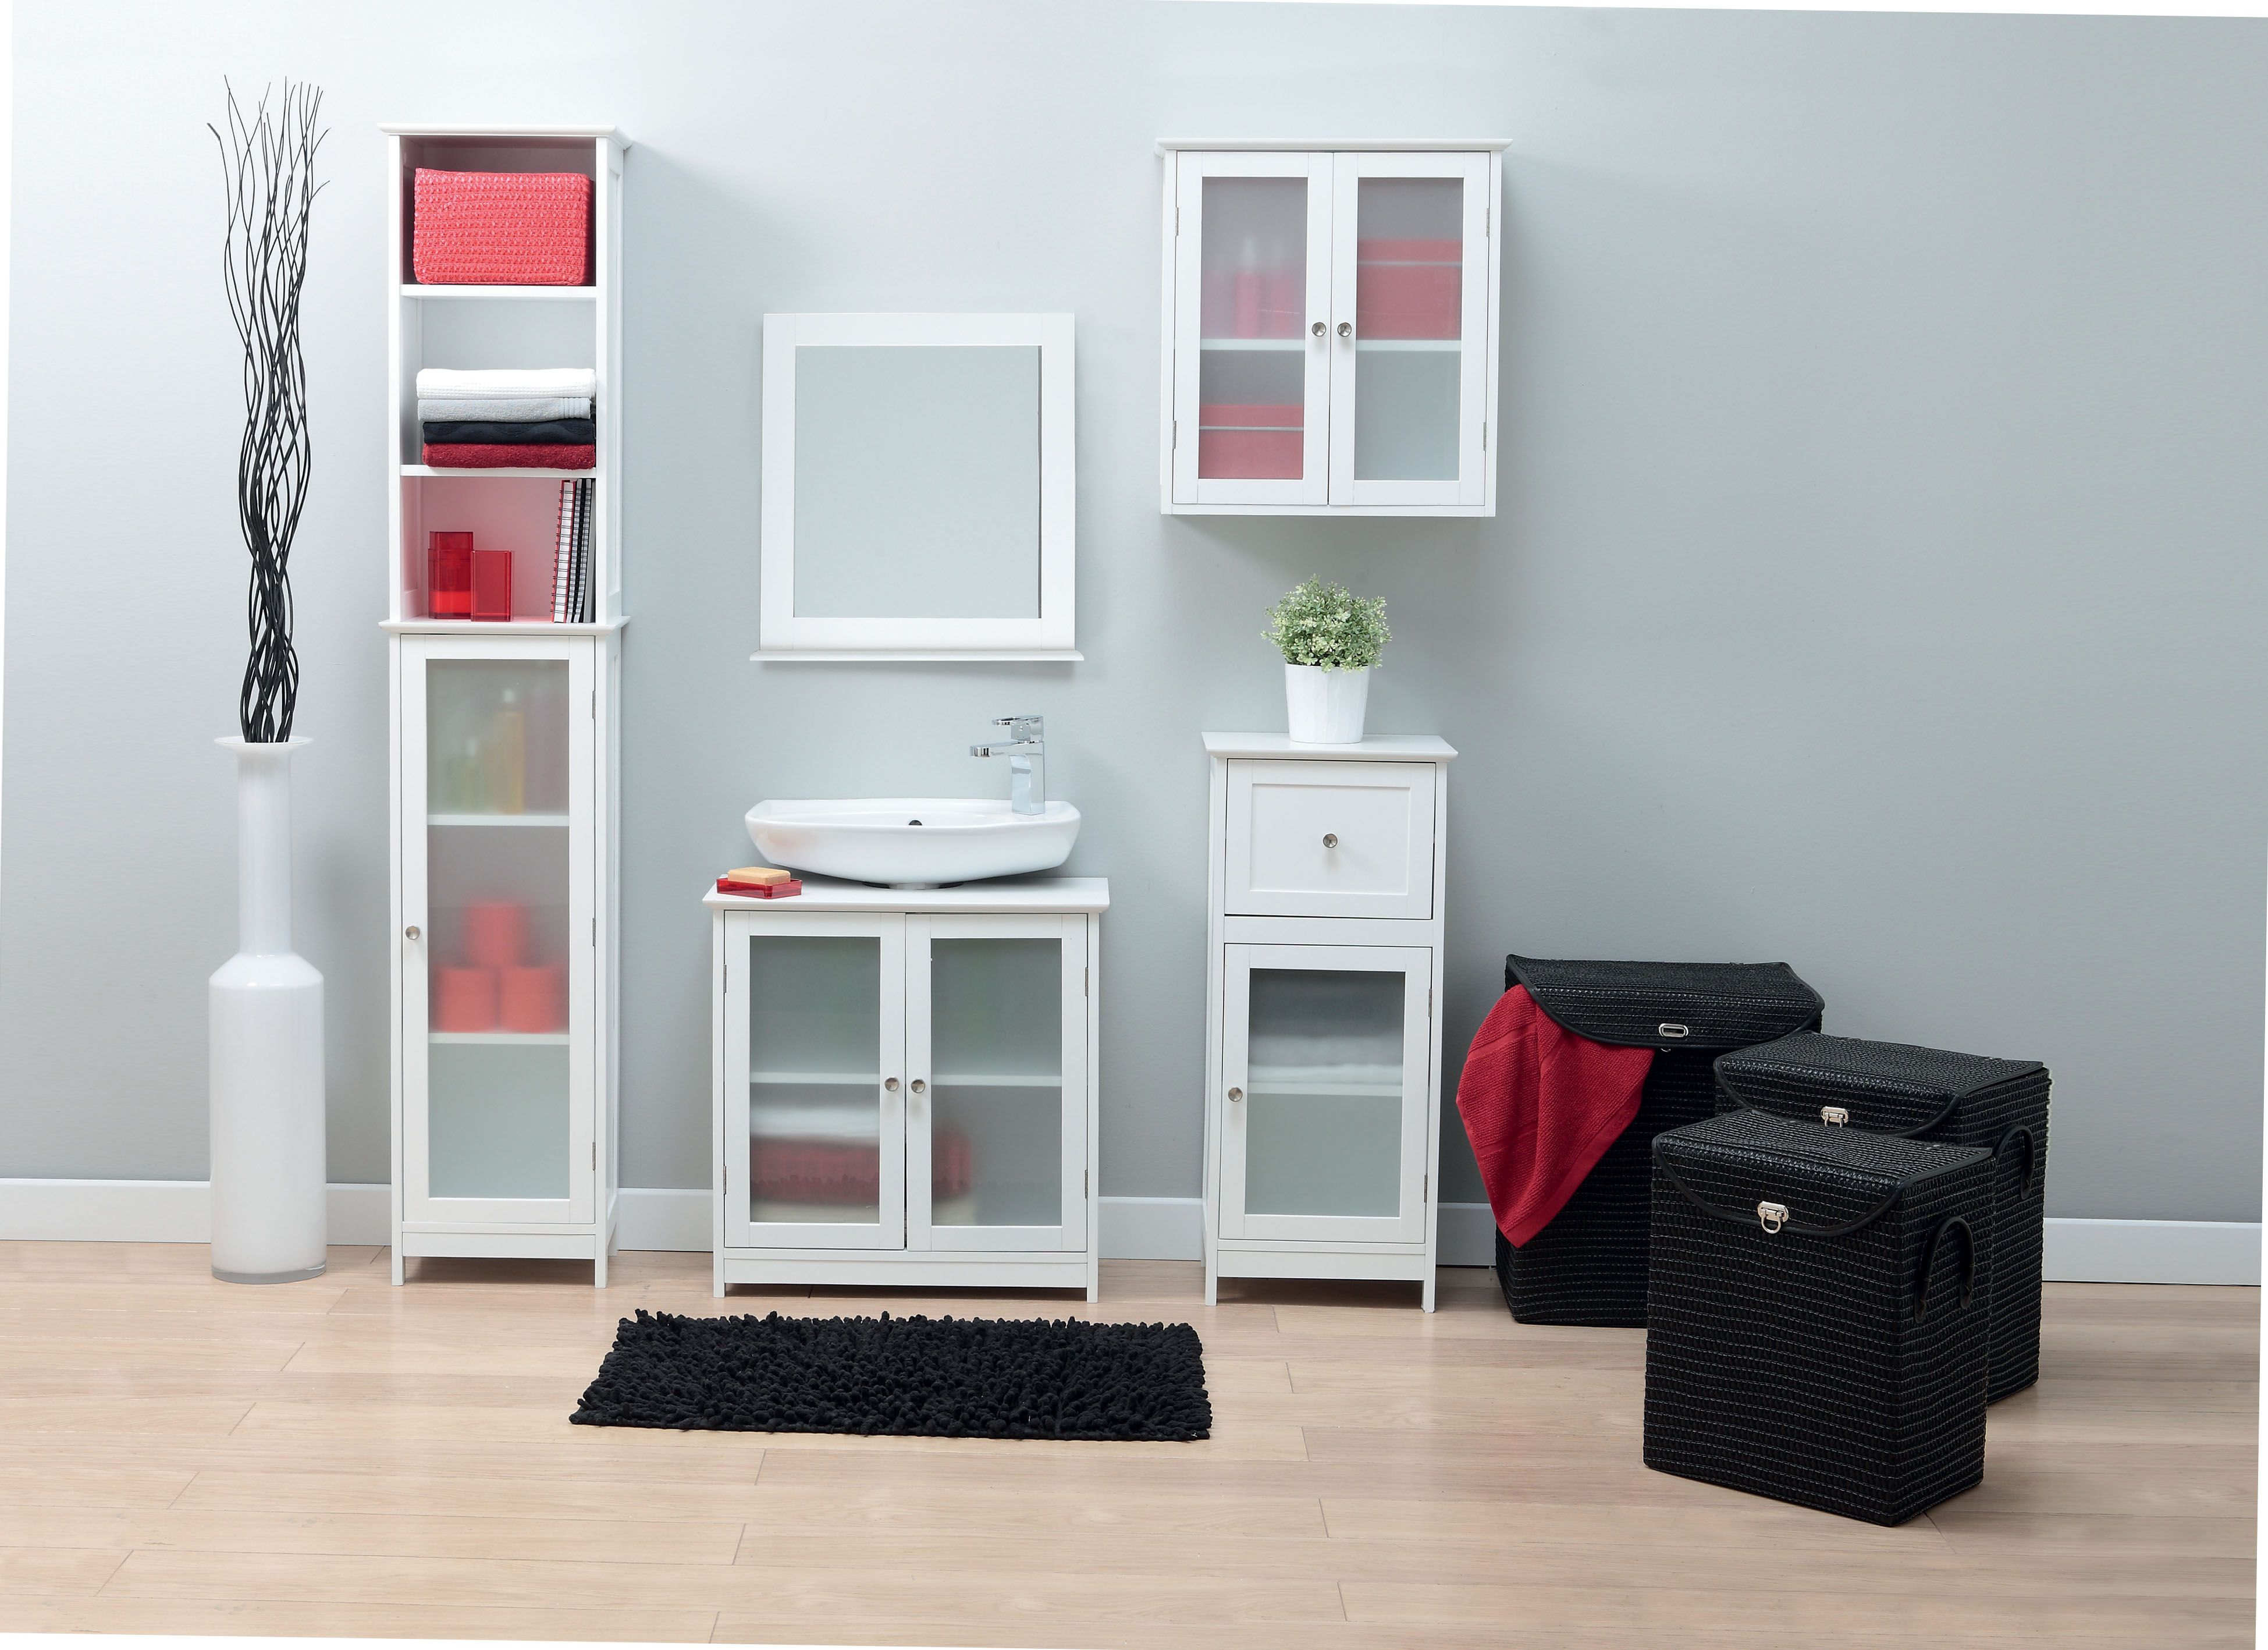 salle de bain pratique centrakor ma salle de bain pinterest ma salle de bain ma salle et. Black Bedroom Furniture Sets. Home Design Ideas